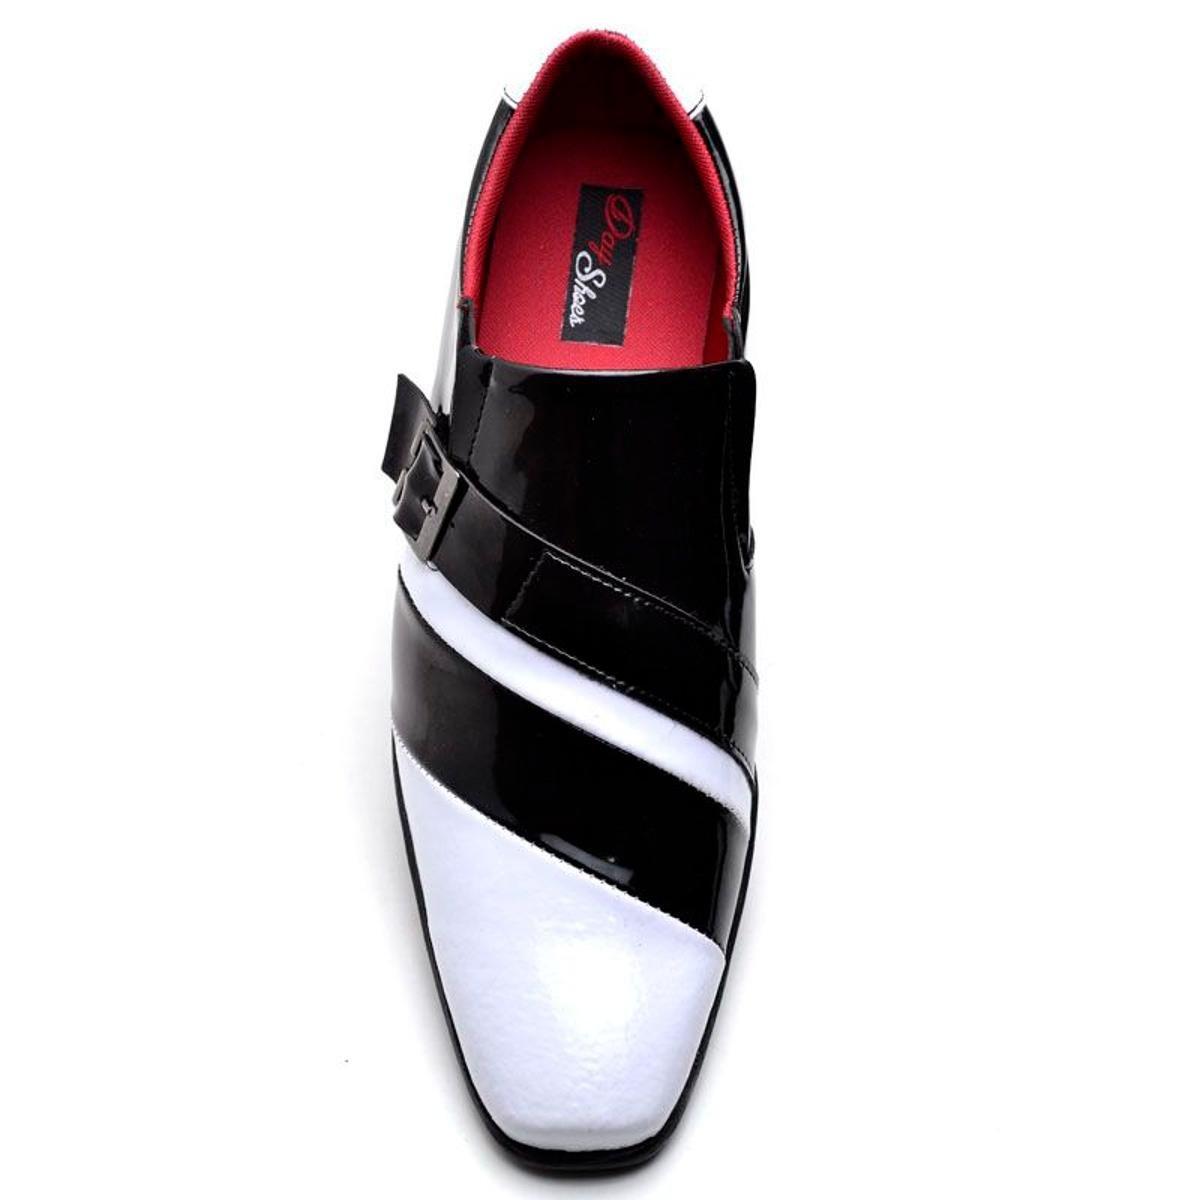 Preto Franca Top Social Sapato Social Sapato Shoes xHYCFPzBwq